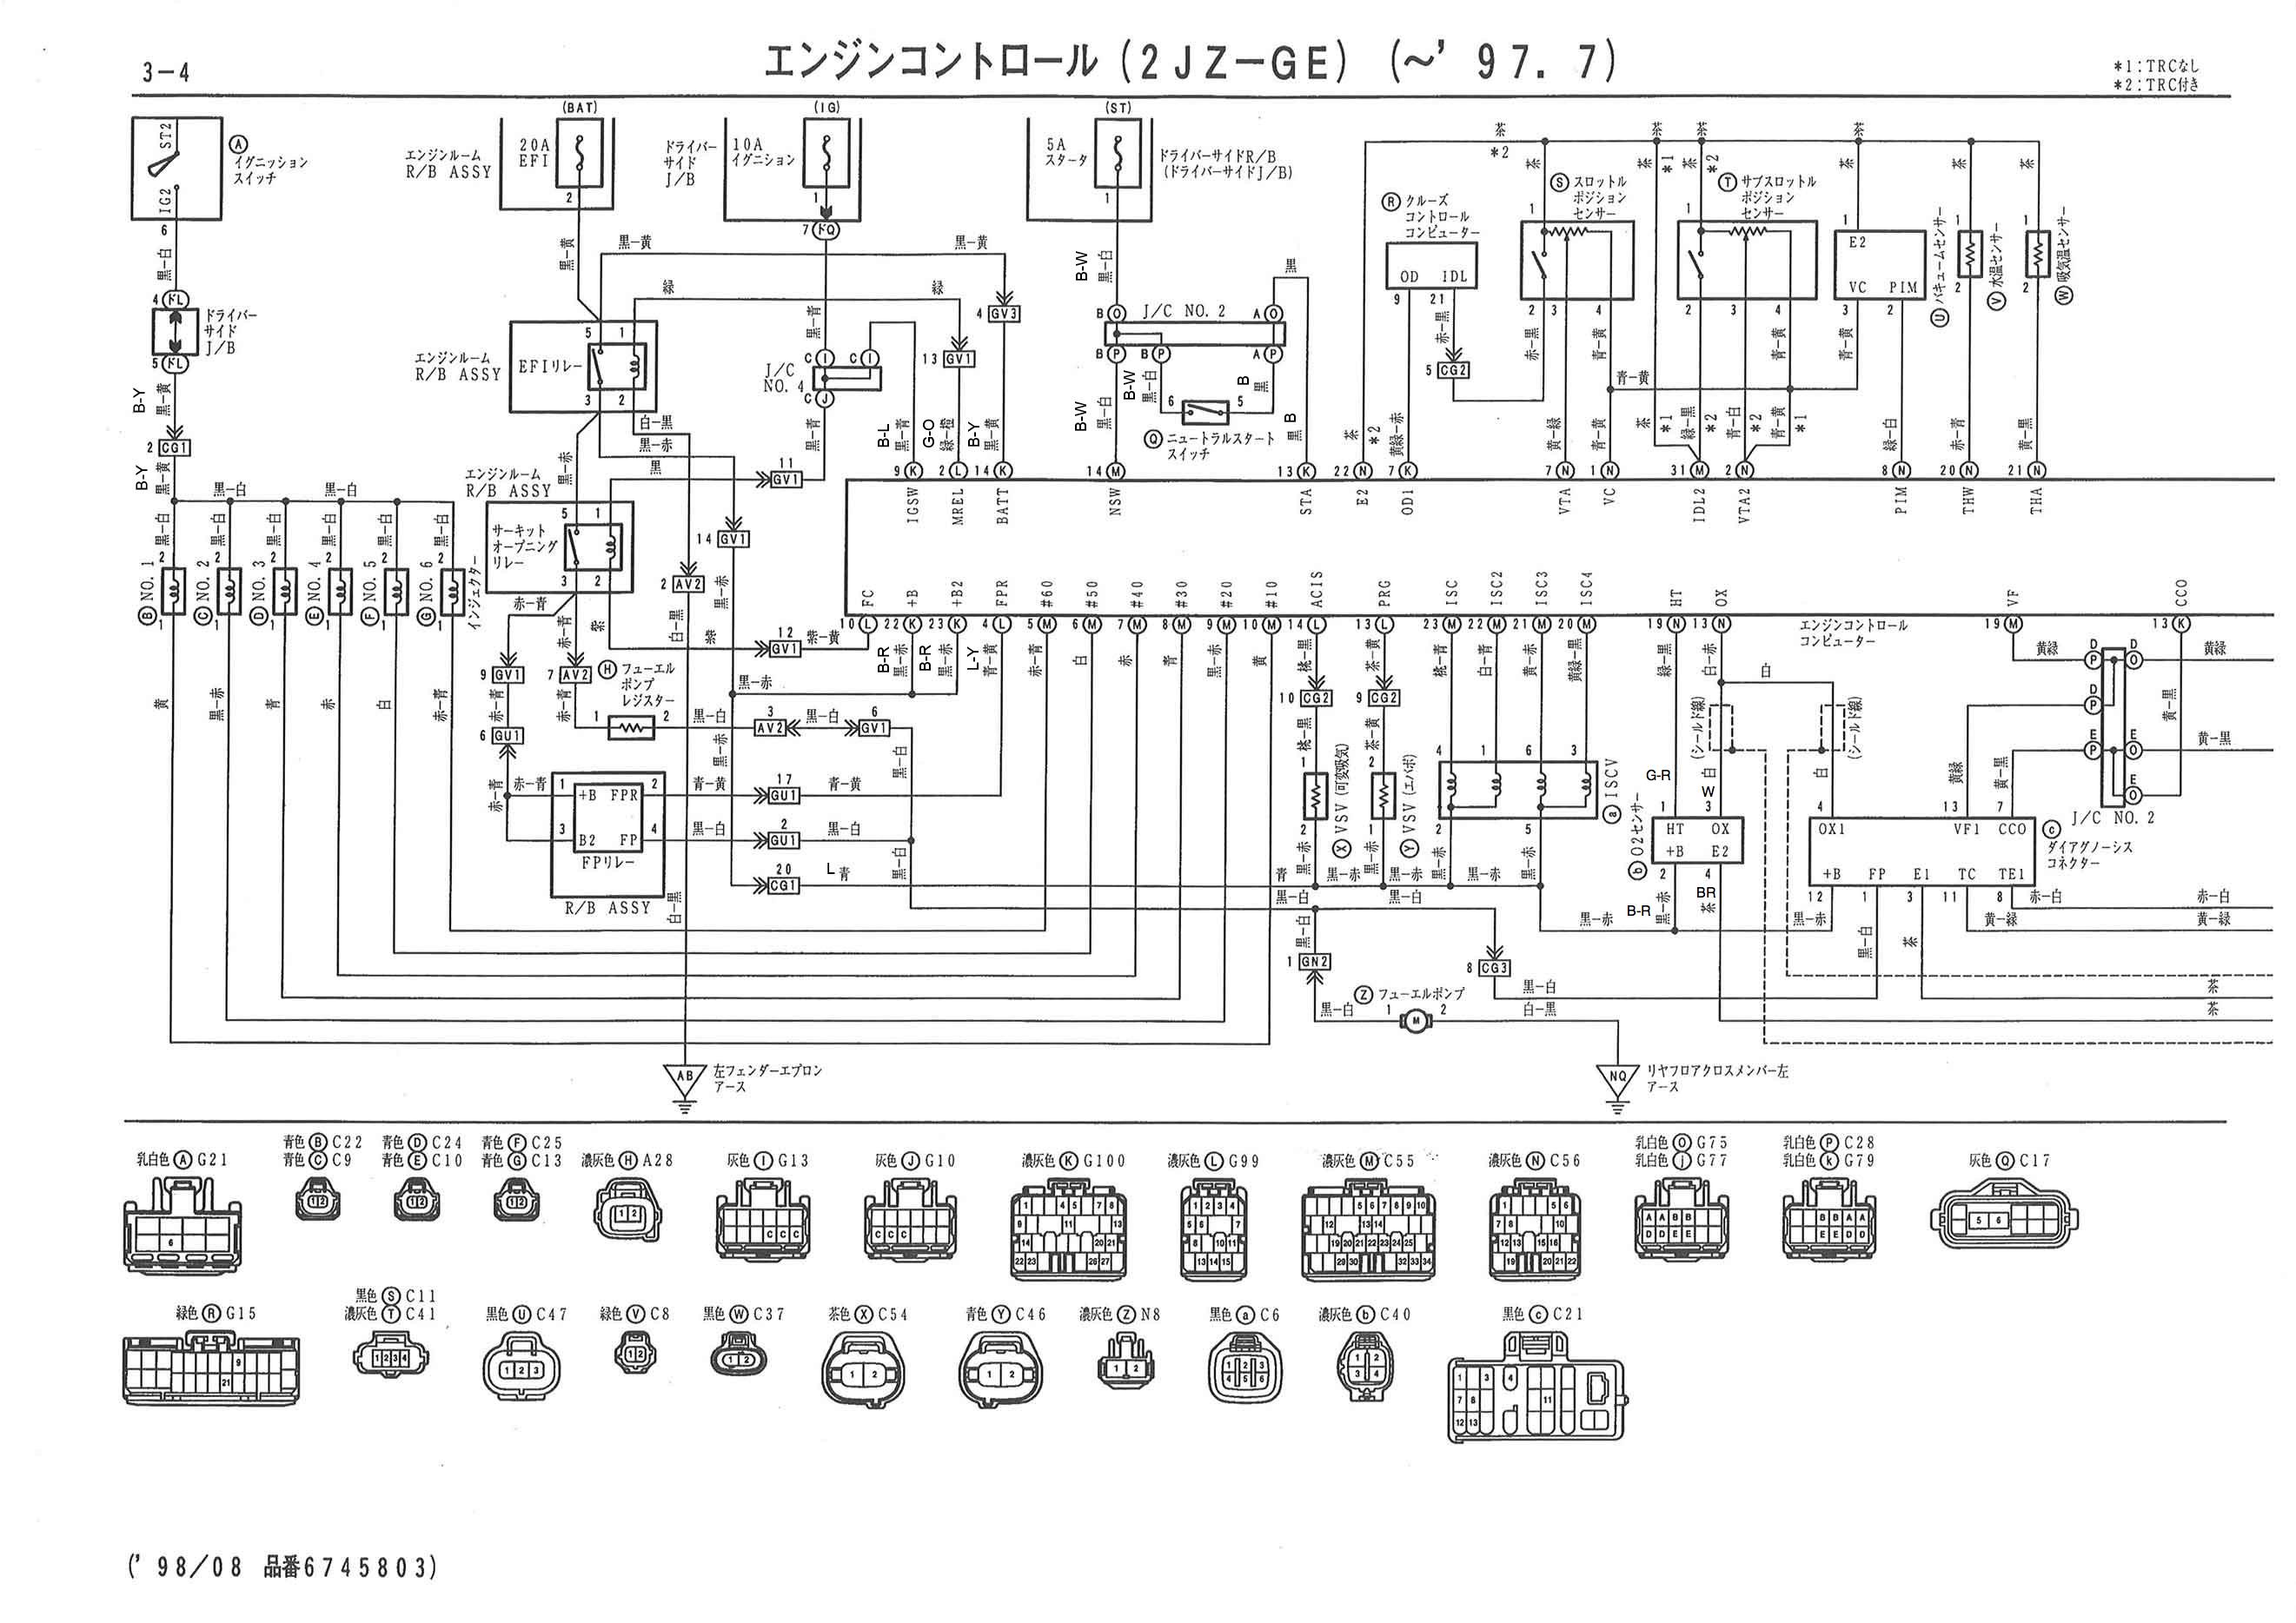 Wilbo666 2jz Ge Vvti Jzs155 Crown Engine Wiring In 2021 Electrical Diagram Wiring Diagram Diagram